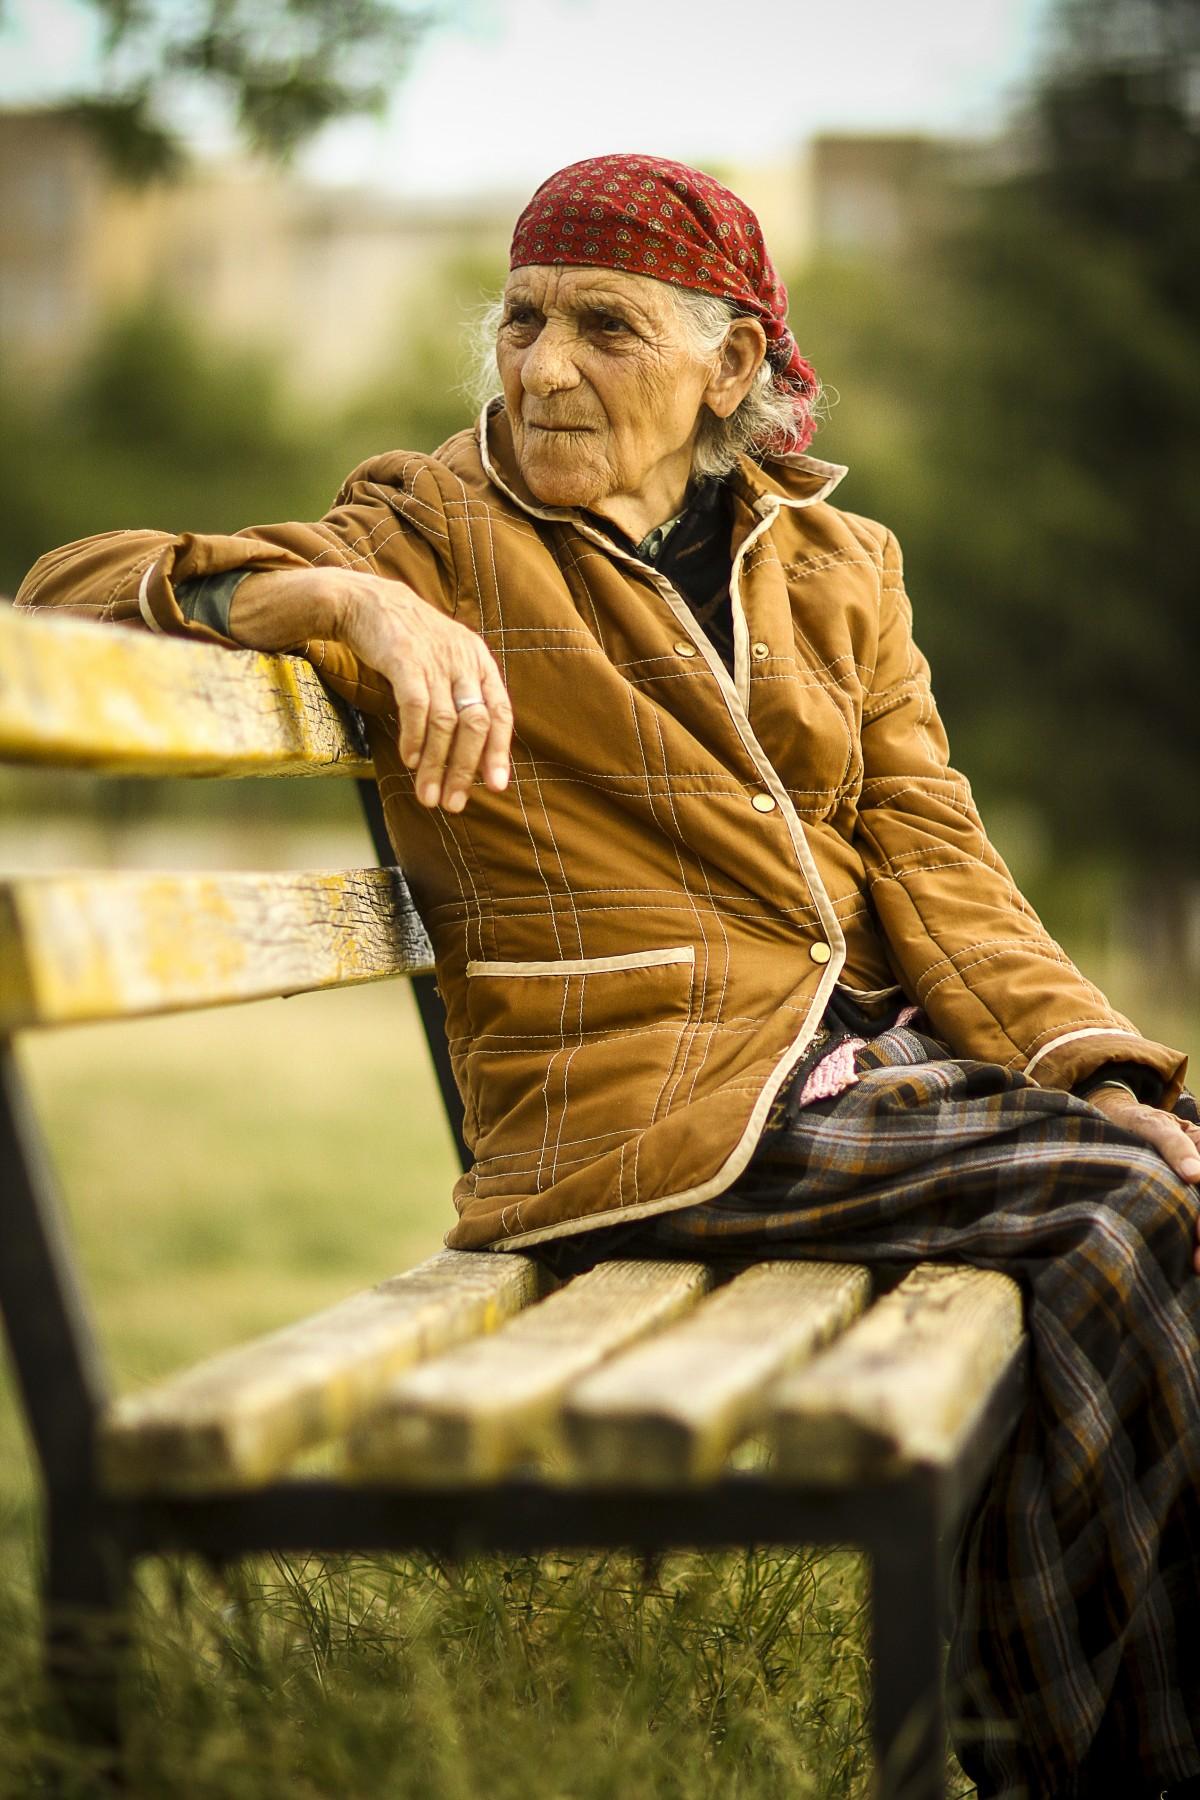 Old Woman Face - Older Women, Mature Women, Mature sex Pictures of elderly woman